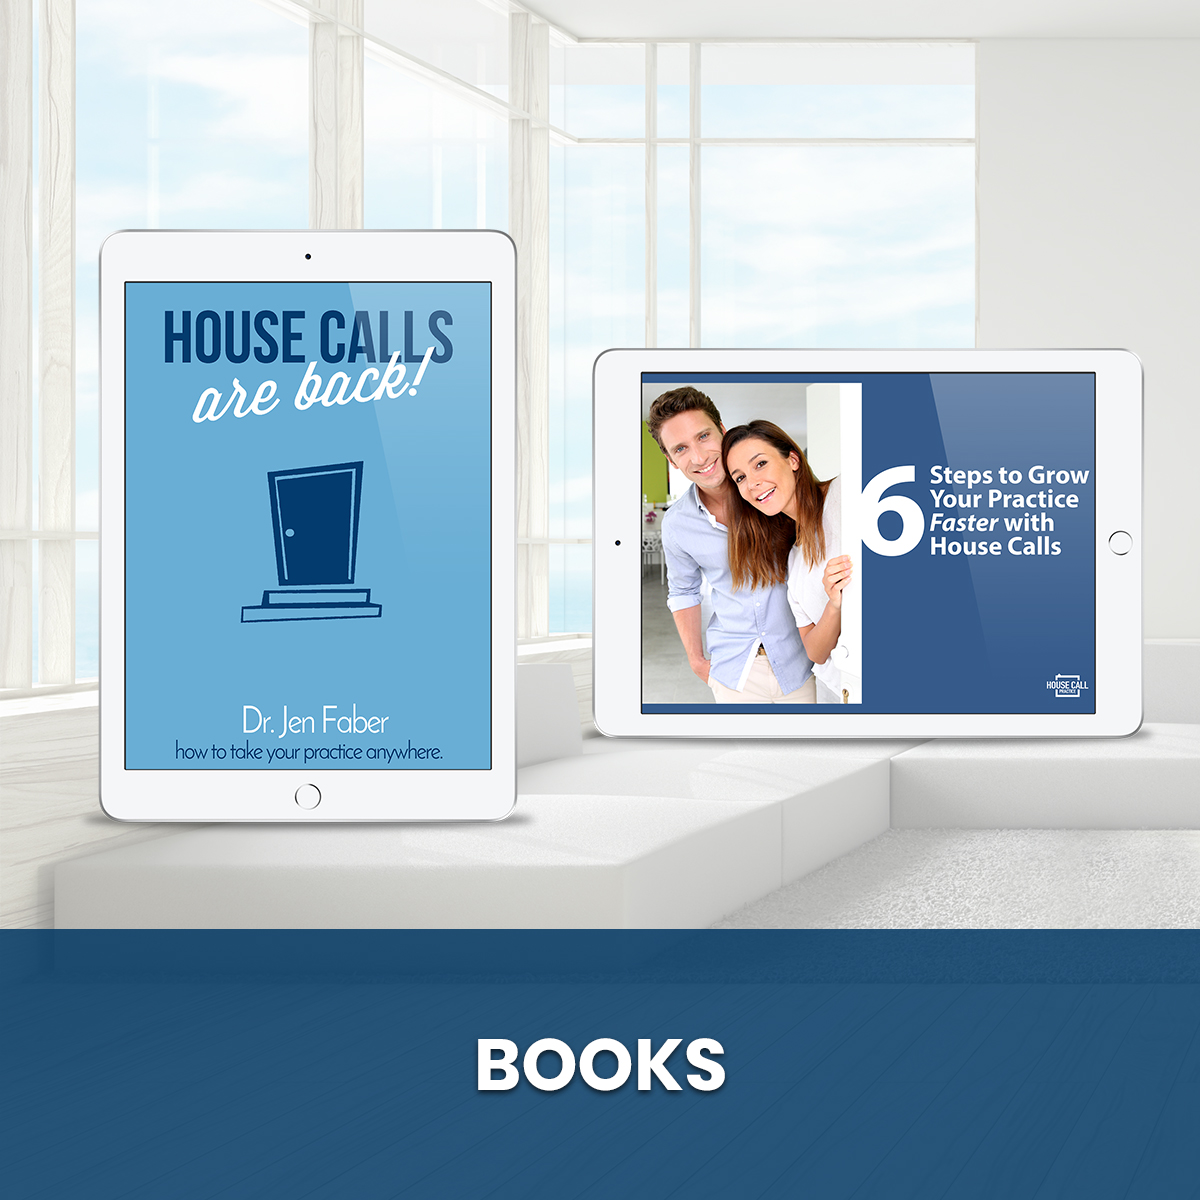 Books - Blue